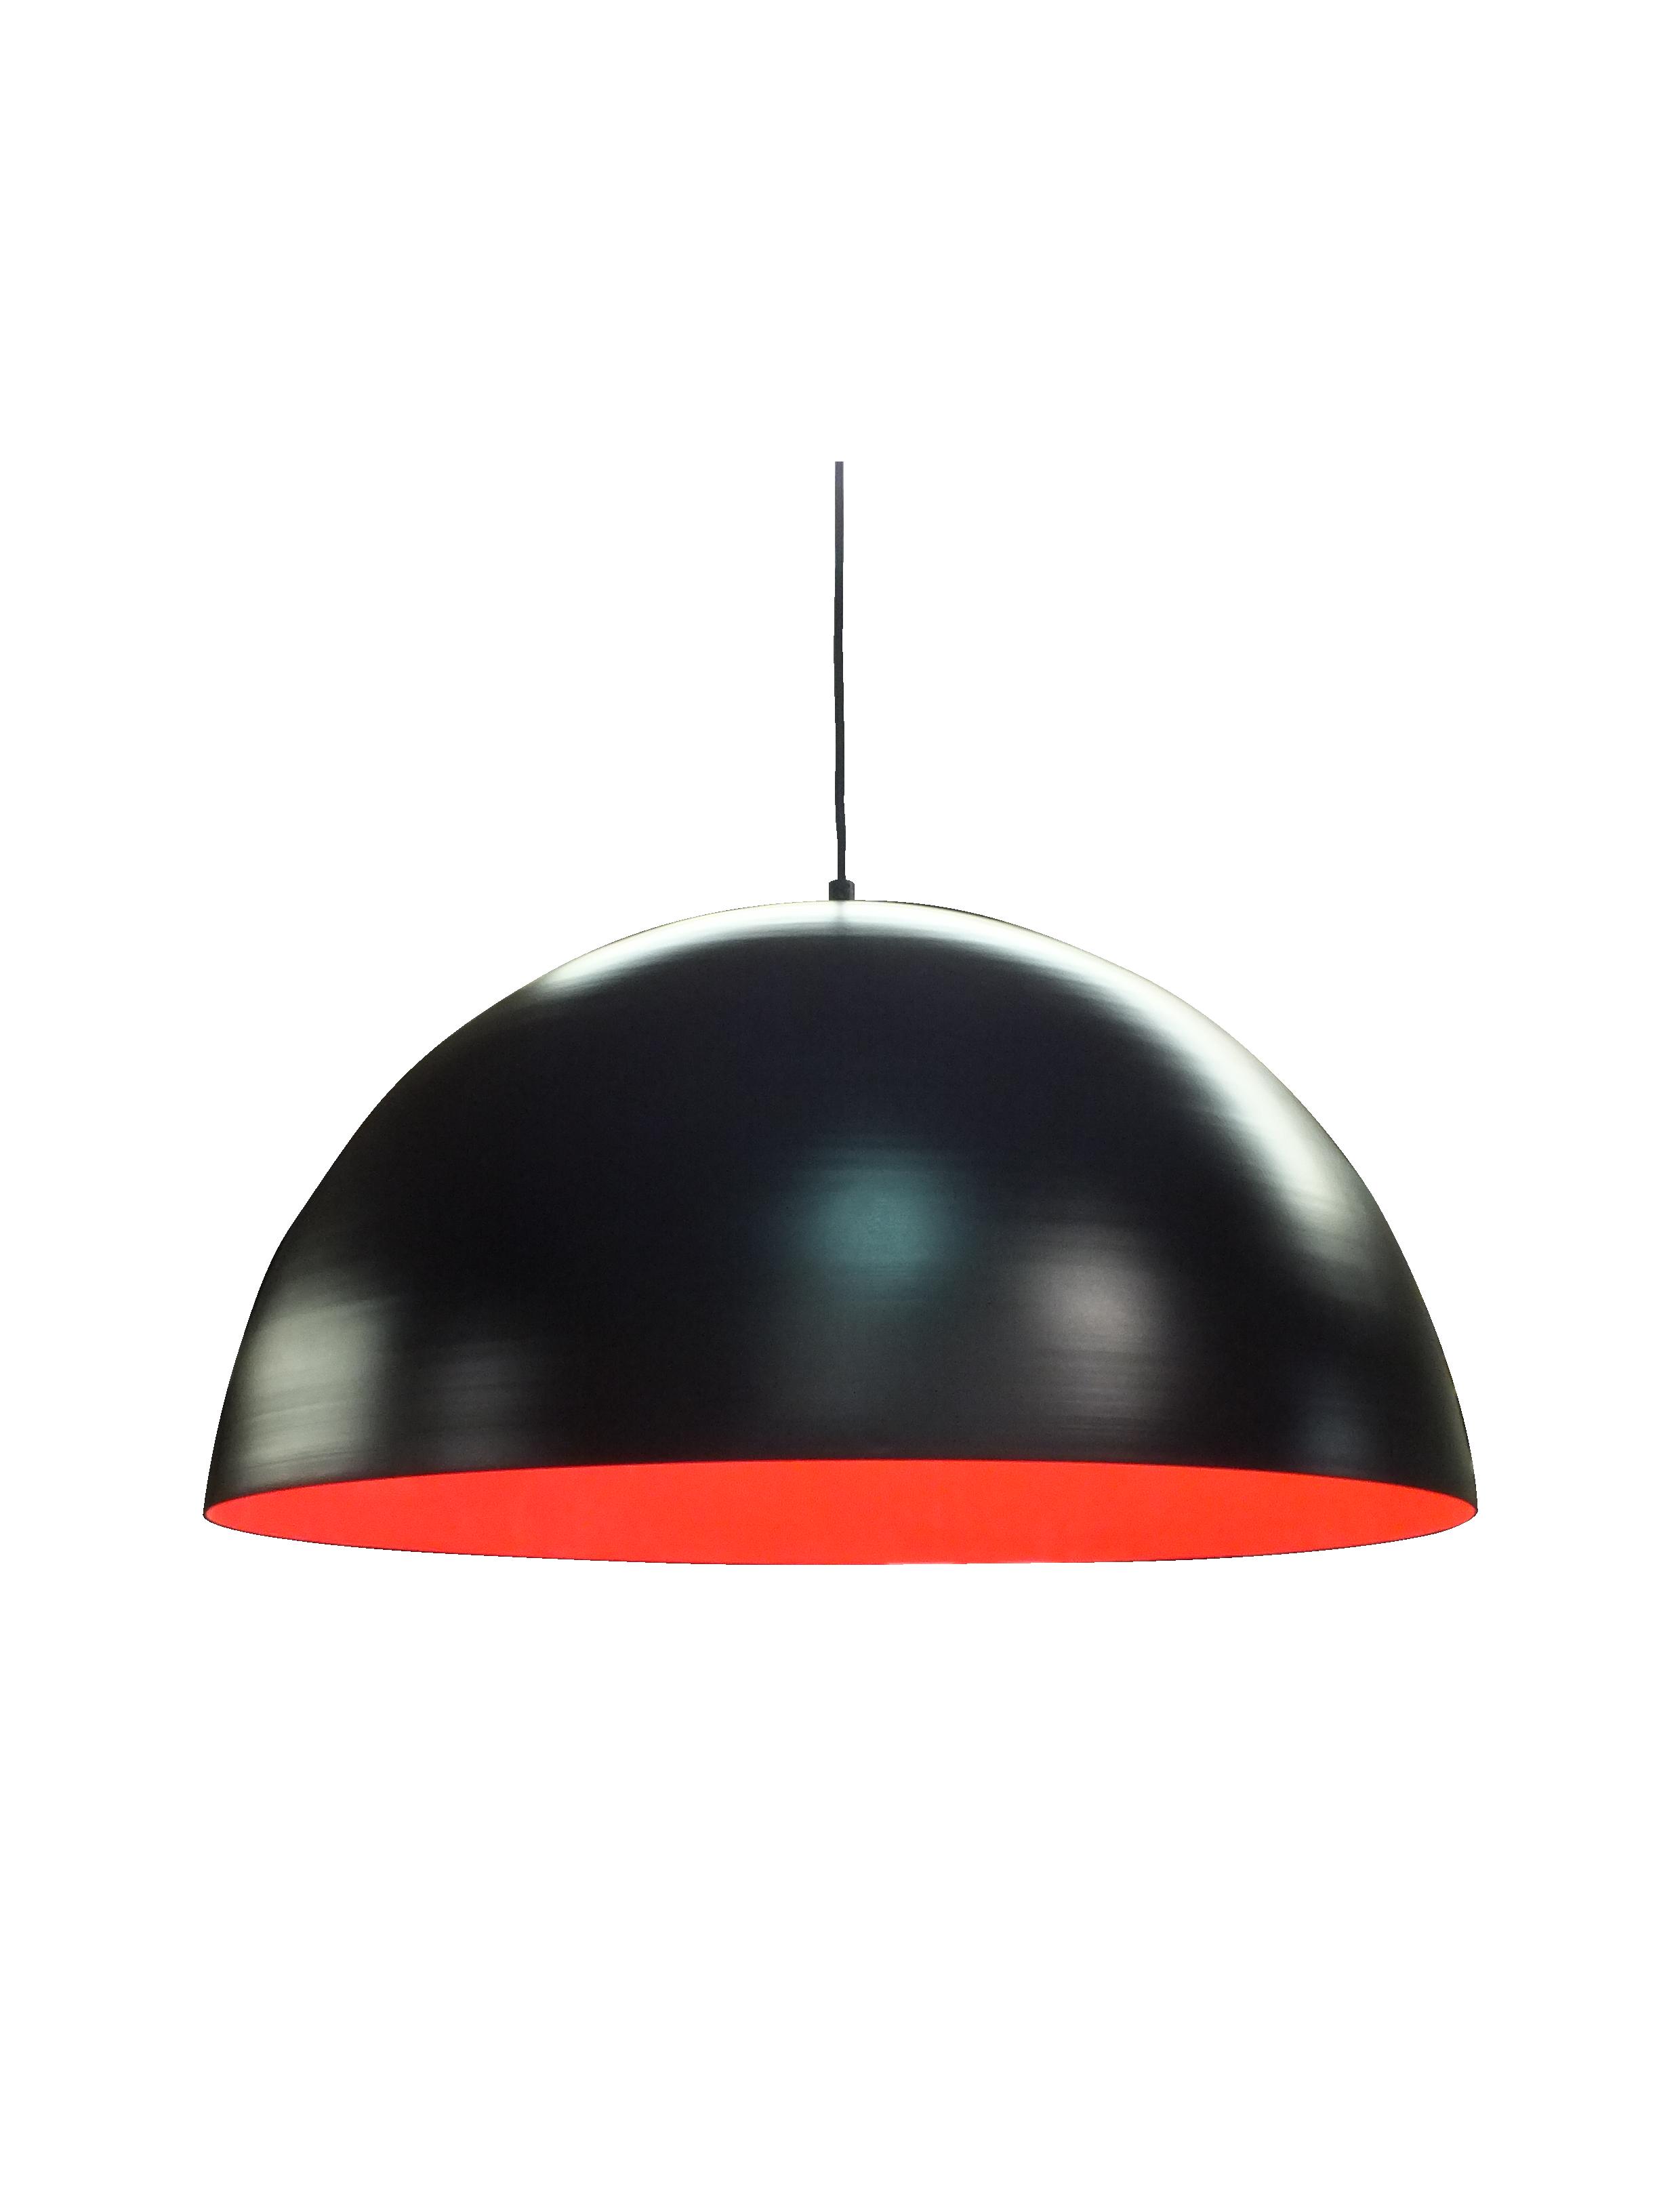 Large Dome – Lighting Fixtures Shop